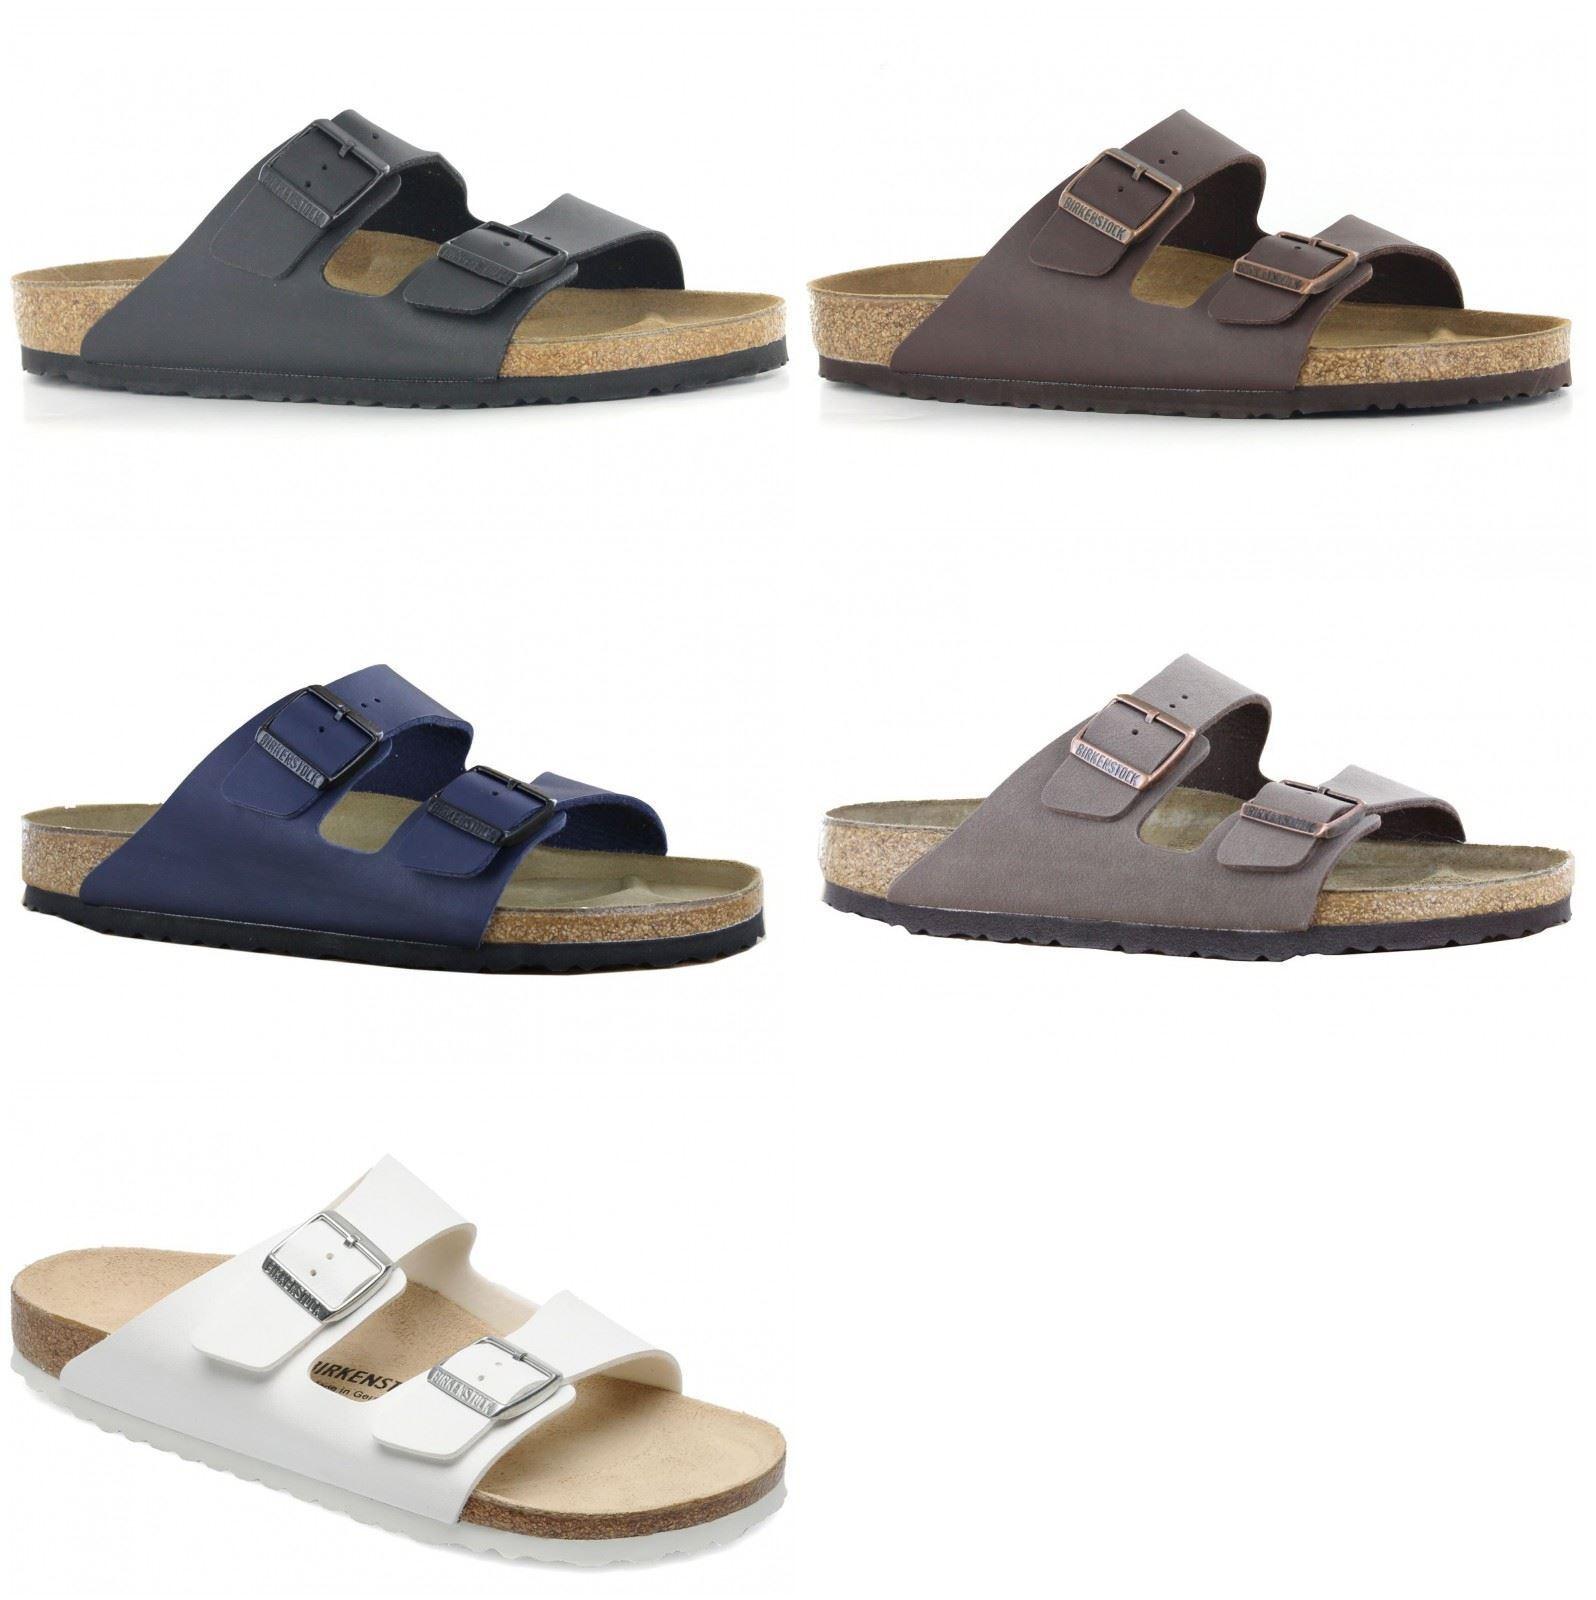 Billig gute Qualität Birkenstock Arizona Mens Sandals